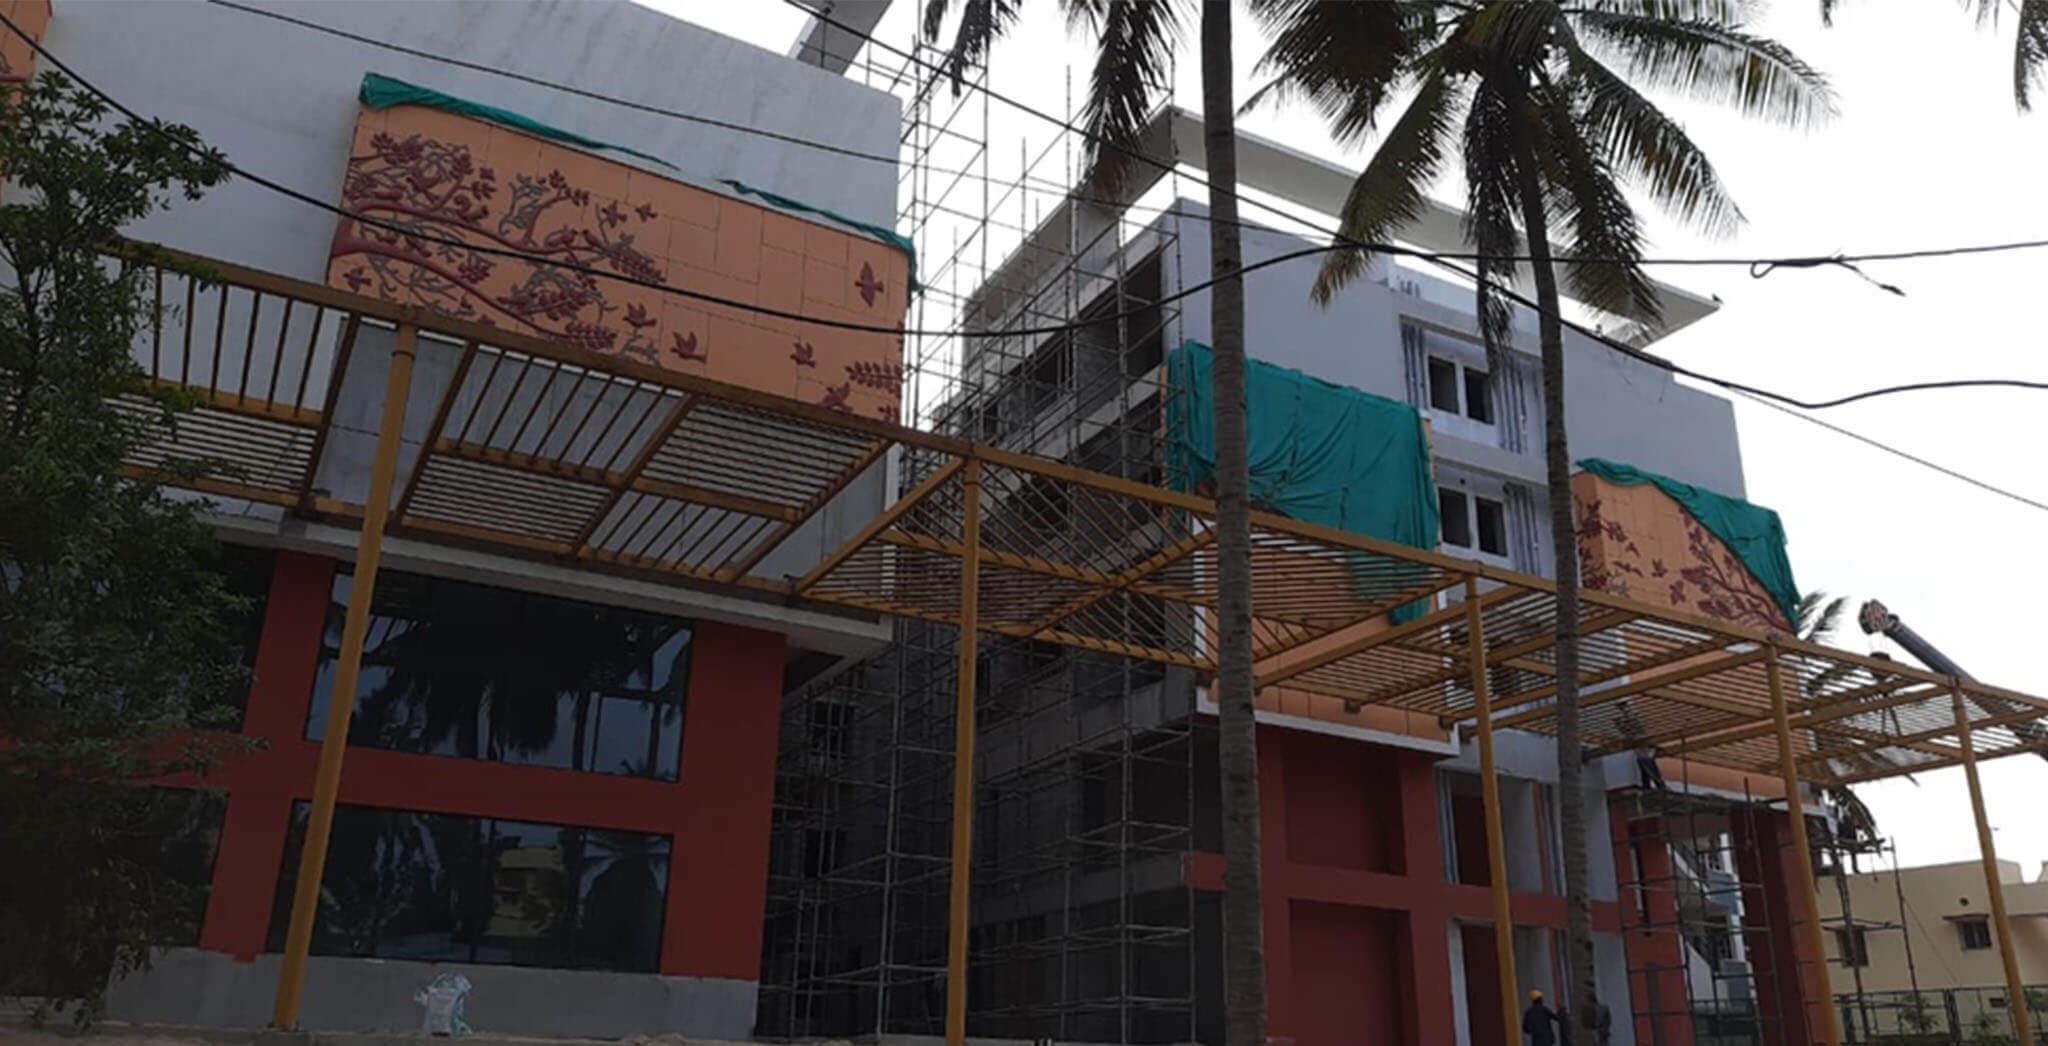 Apr 2021 - East entry pergola work under progress